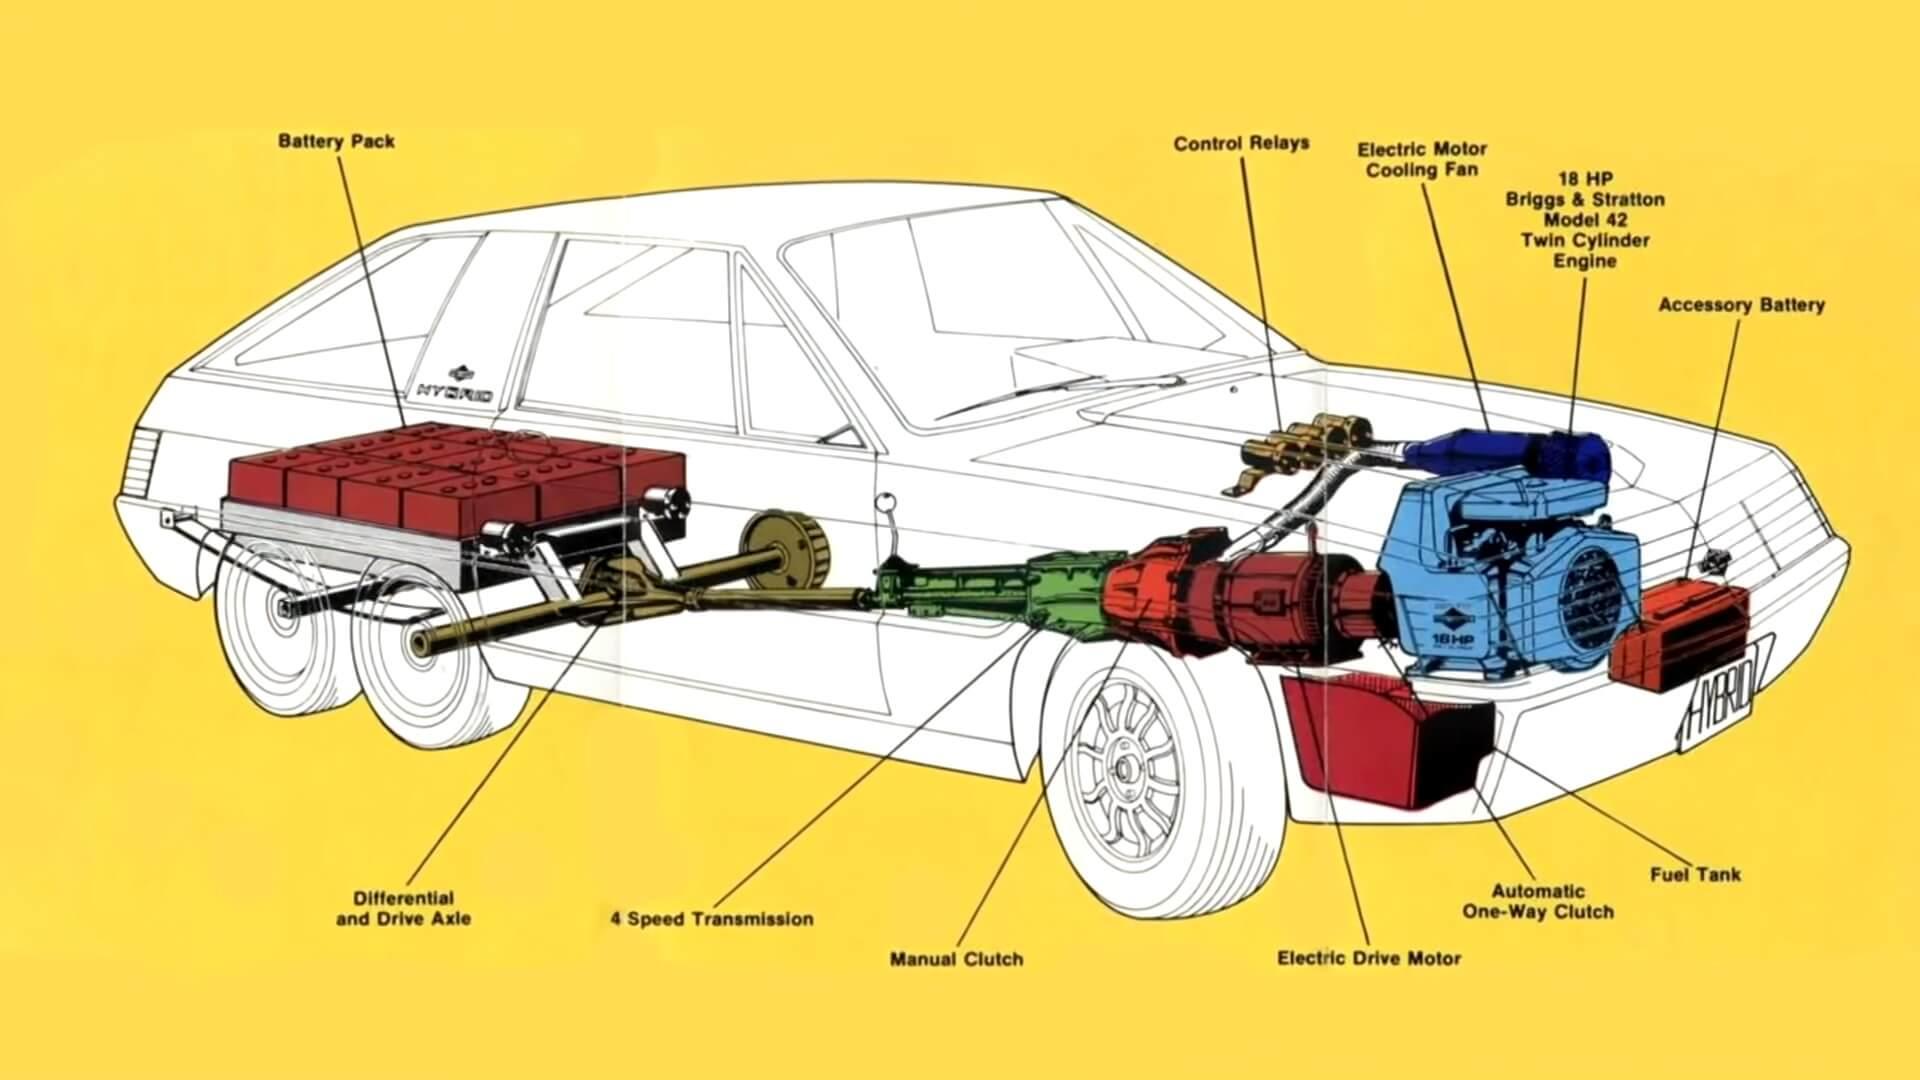 Концепт-кар Briggs & Stratton Hybrid 1980 года был оснащен 18-сильным двухцилиндровым двигателем Briggs & Stratton и небольшим электромотором